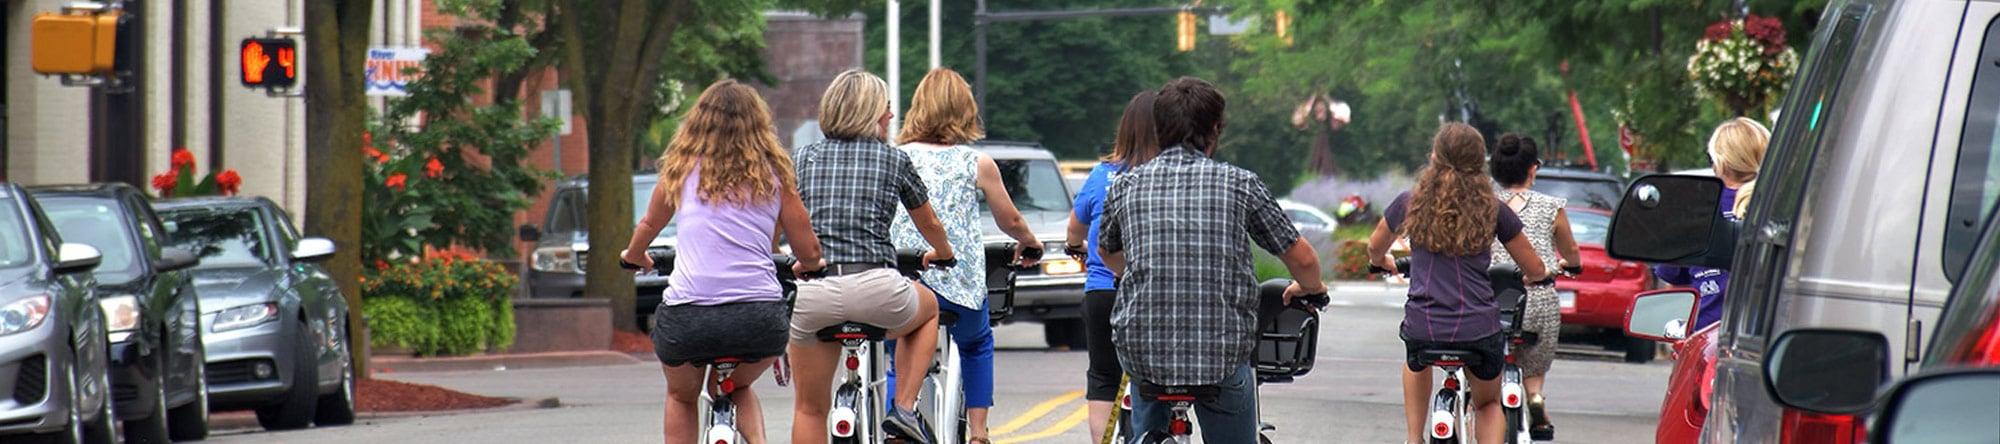 bikeshare bikers on fifth street